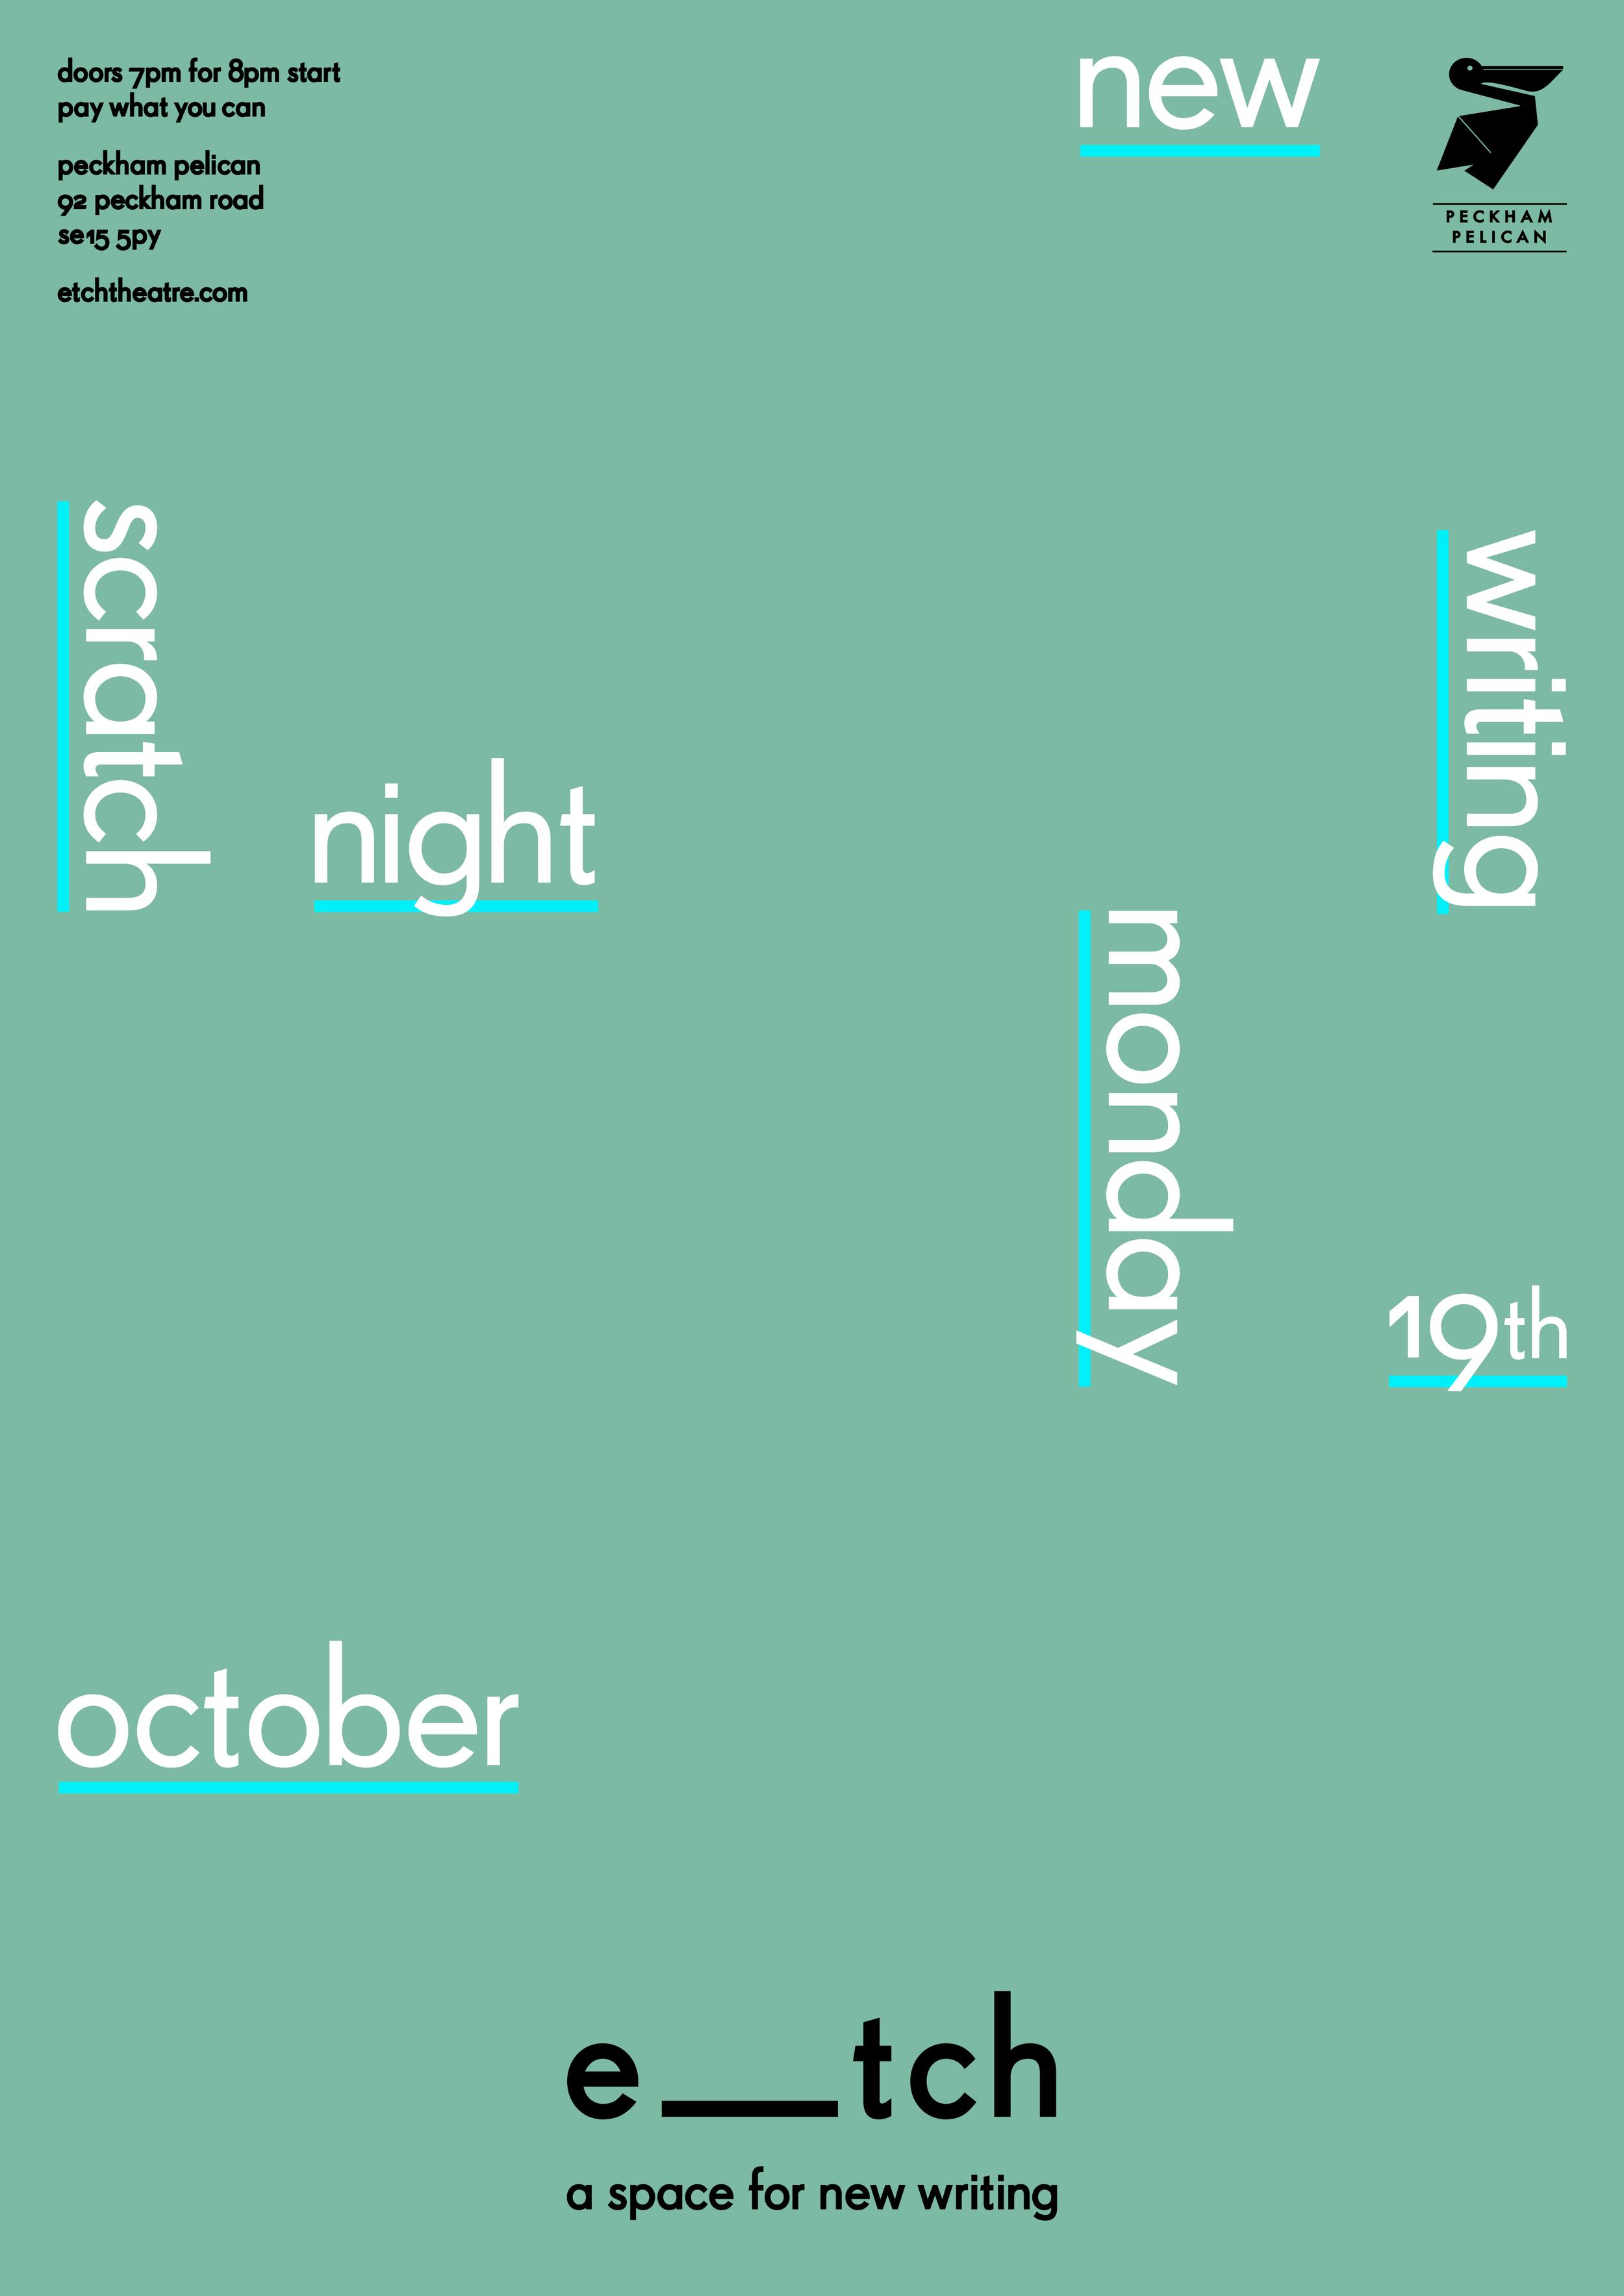 Etch_October_Evite.png